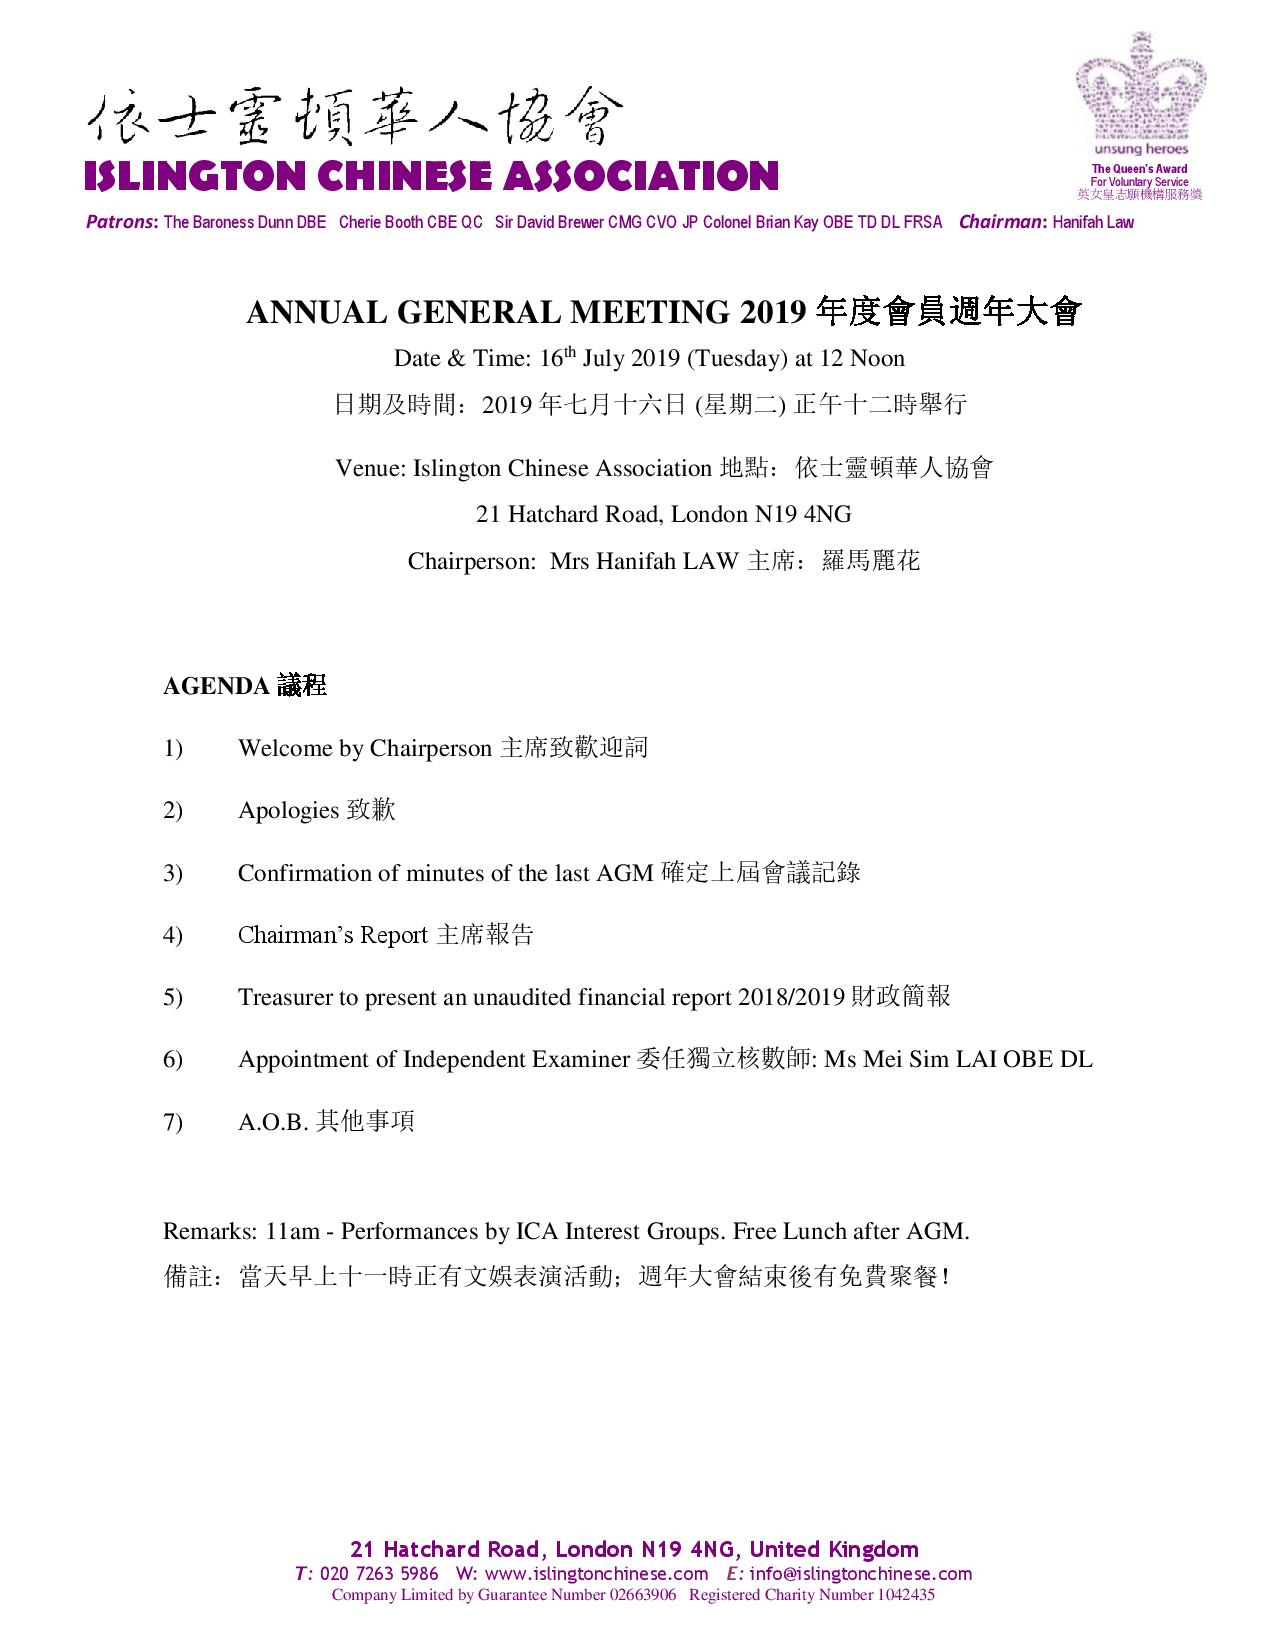 ICA AGM Agenda 16.07.2019